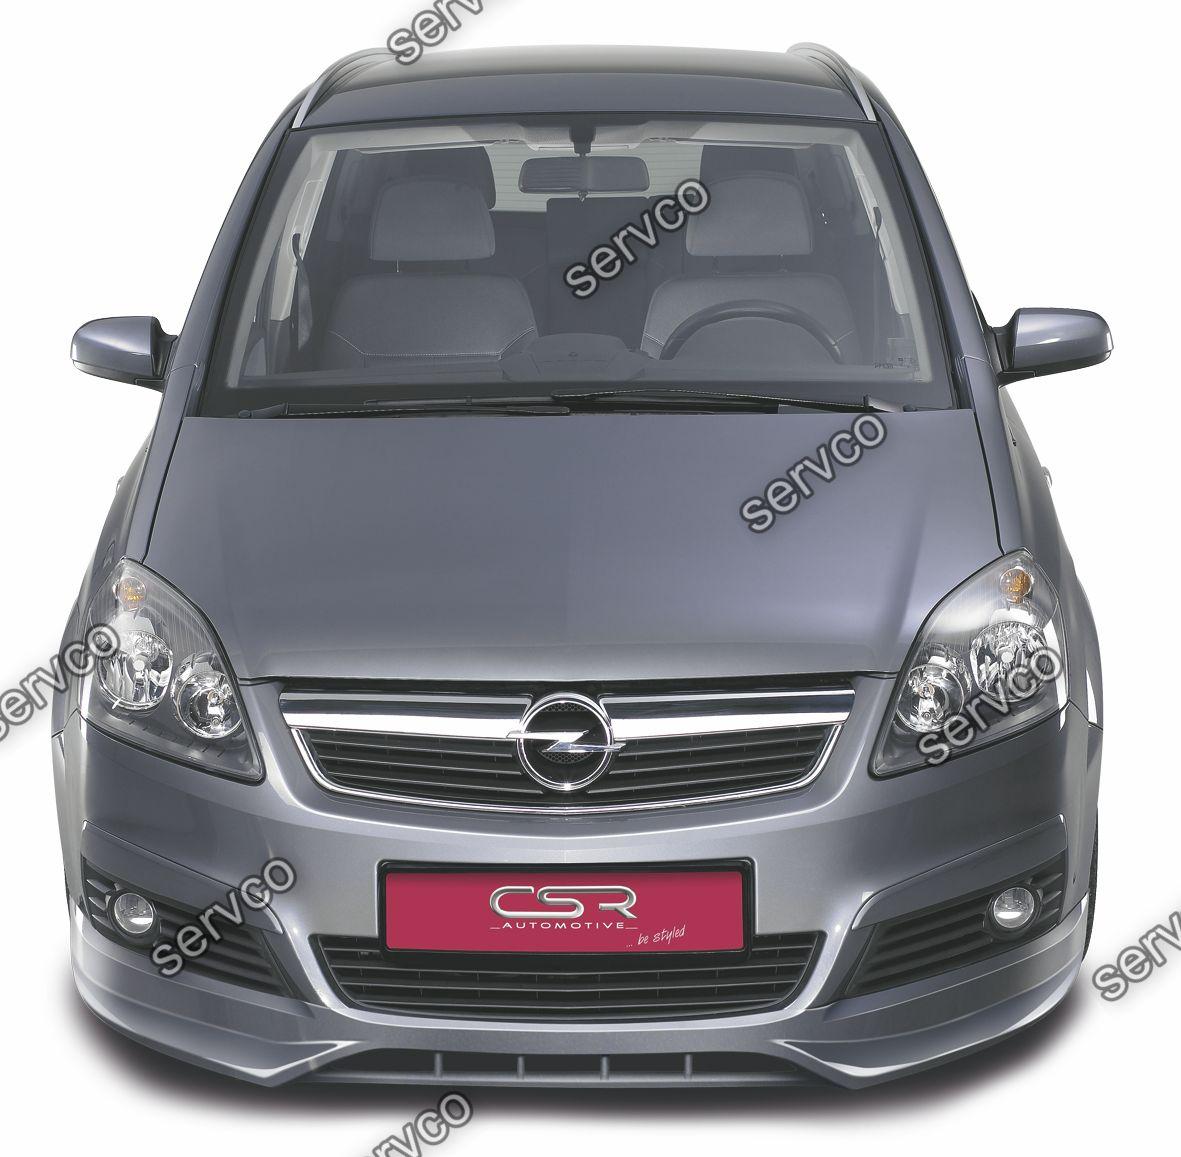 Prelungire tuning sport bara fata Opel Zafira B FA096 2005-2008 v2